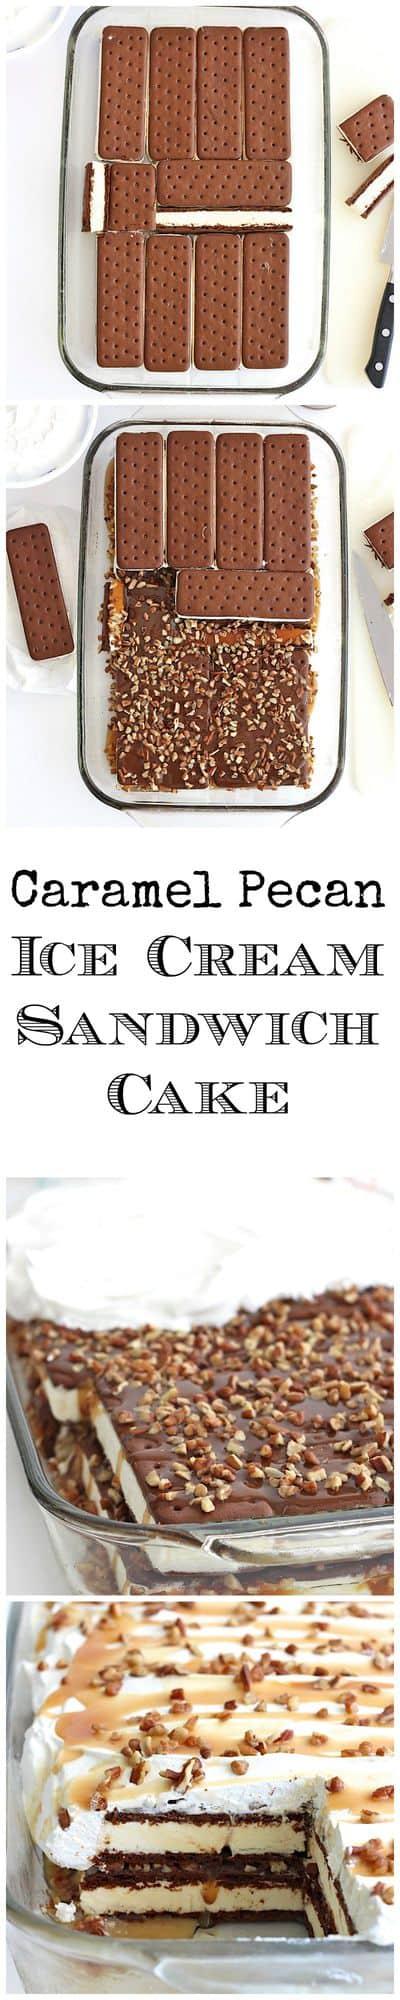 Caramel Pecan Ice Cream Sandwich Cake